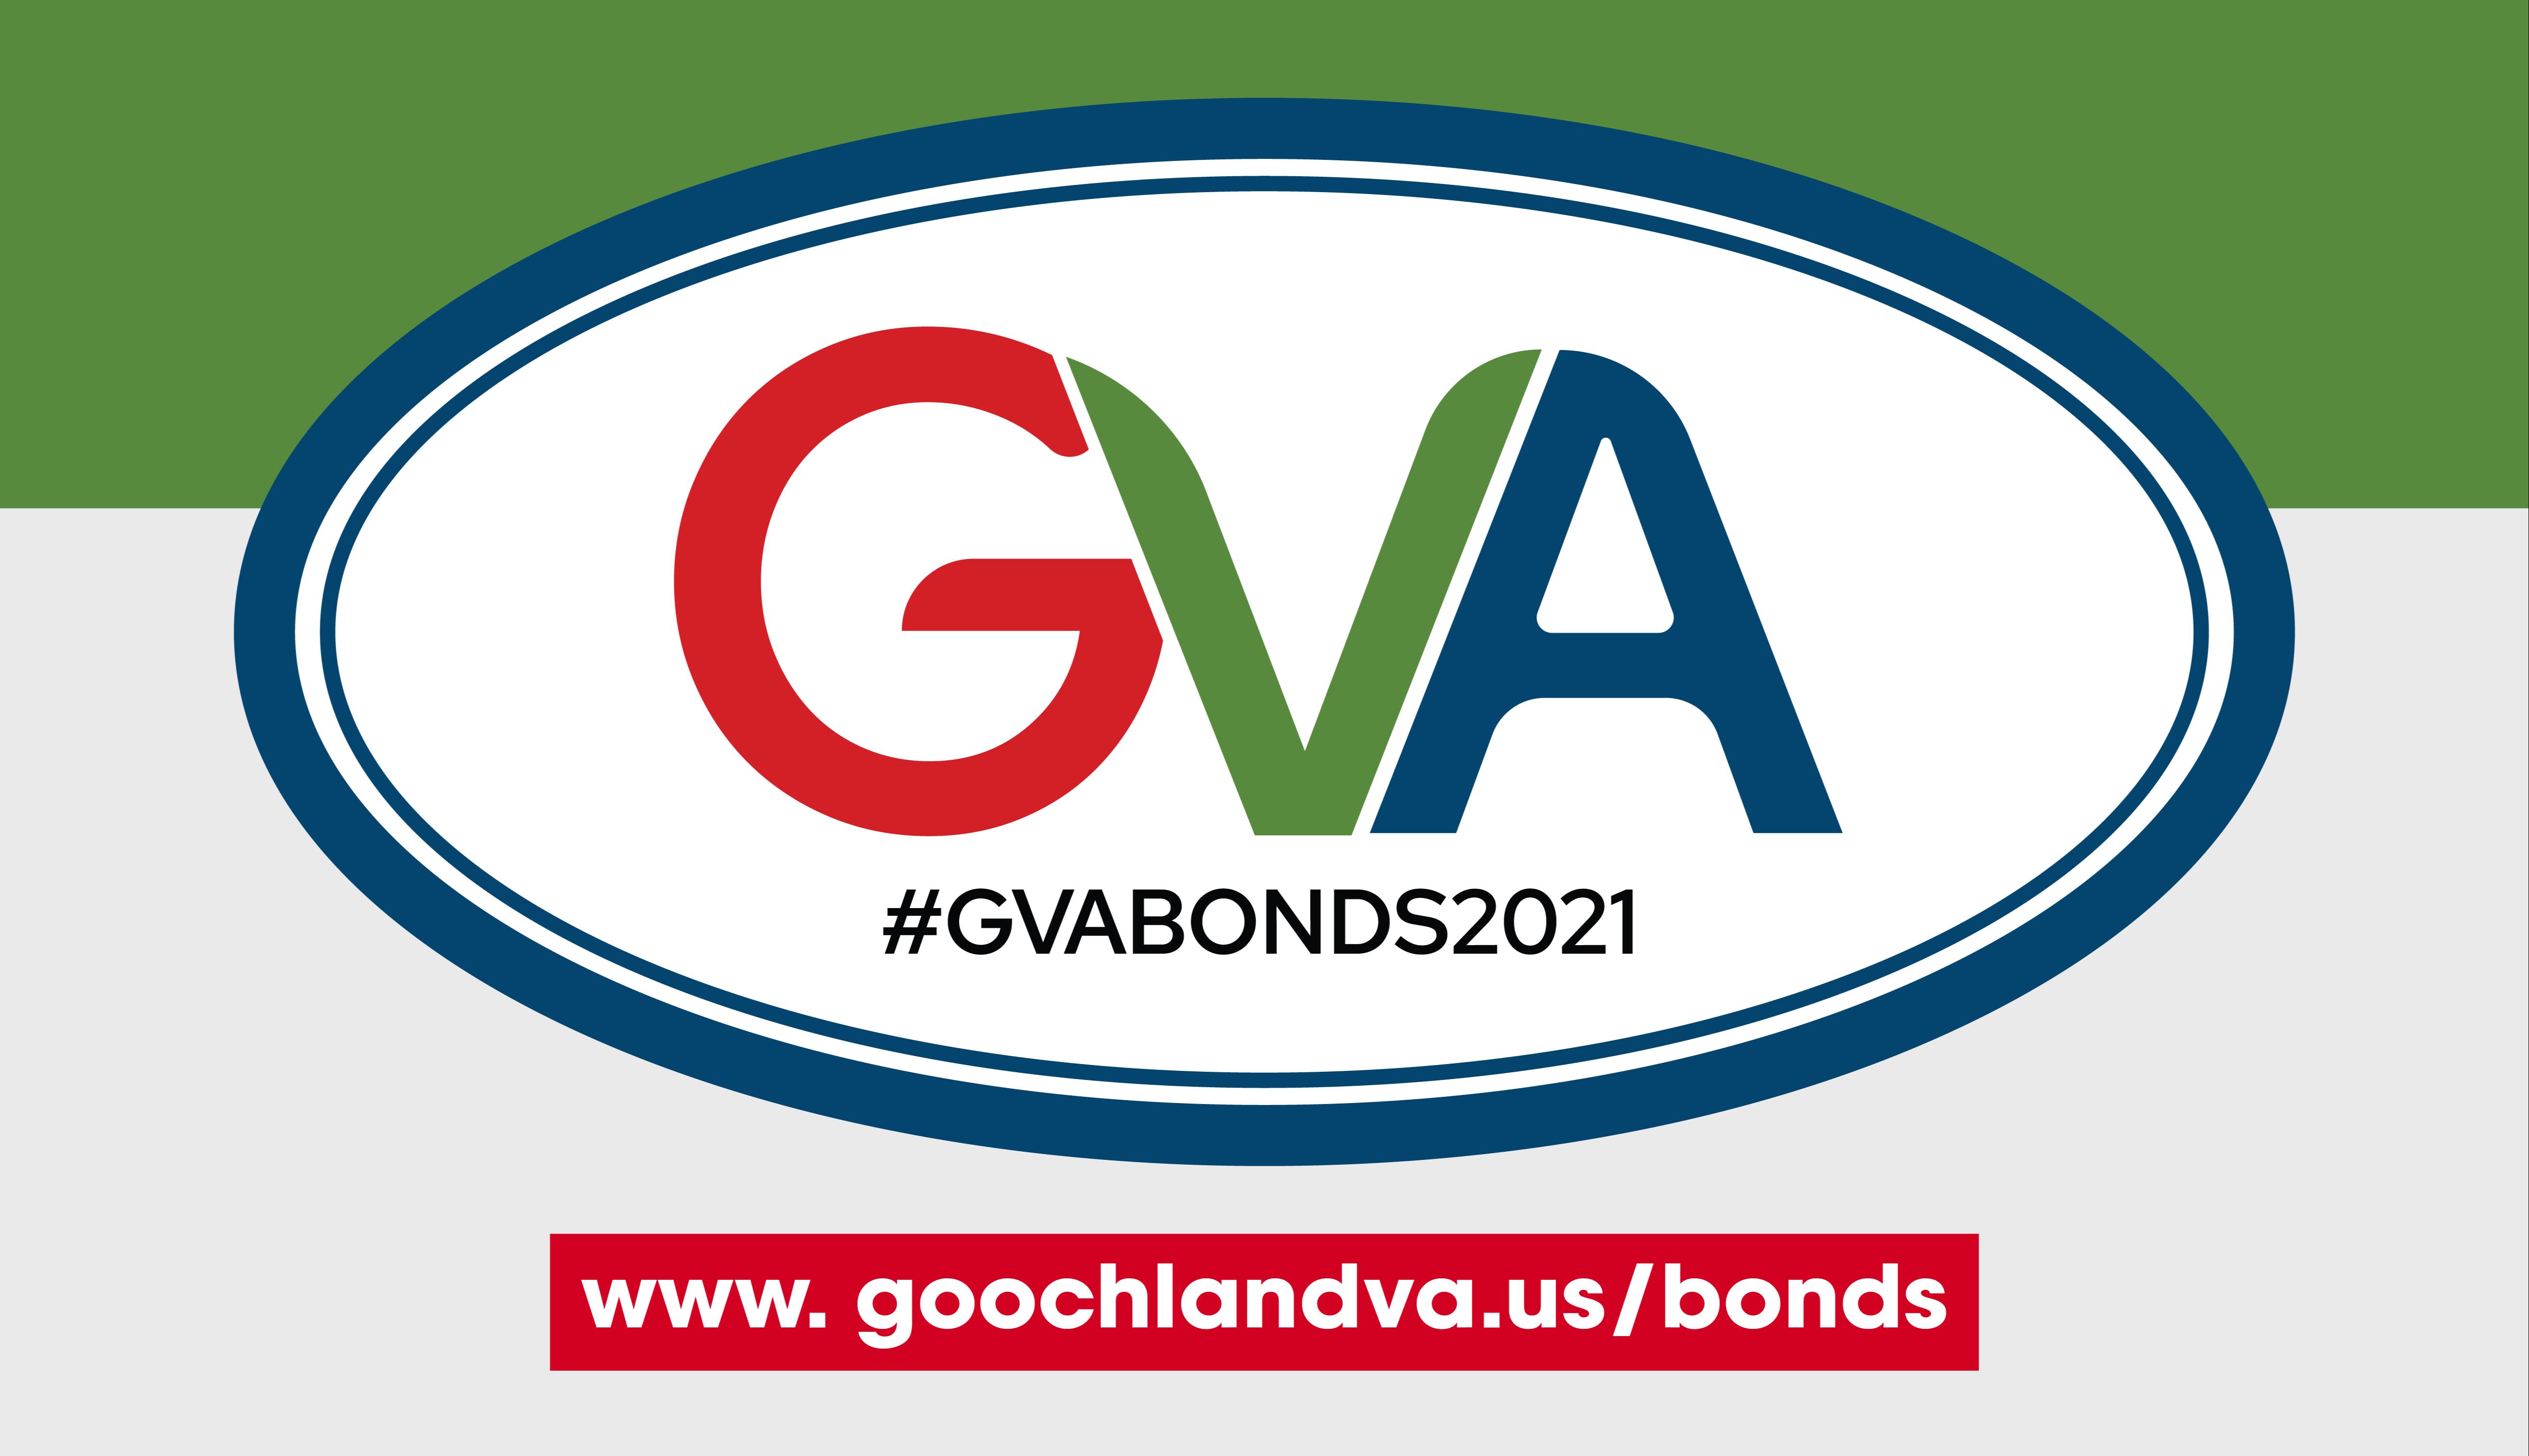 Goochland bond referendum logo GVA #GCABONDS2021